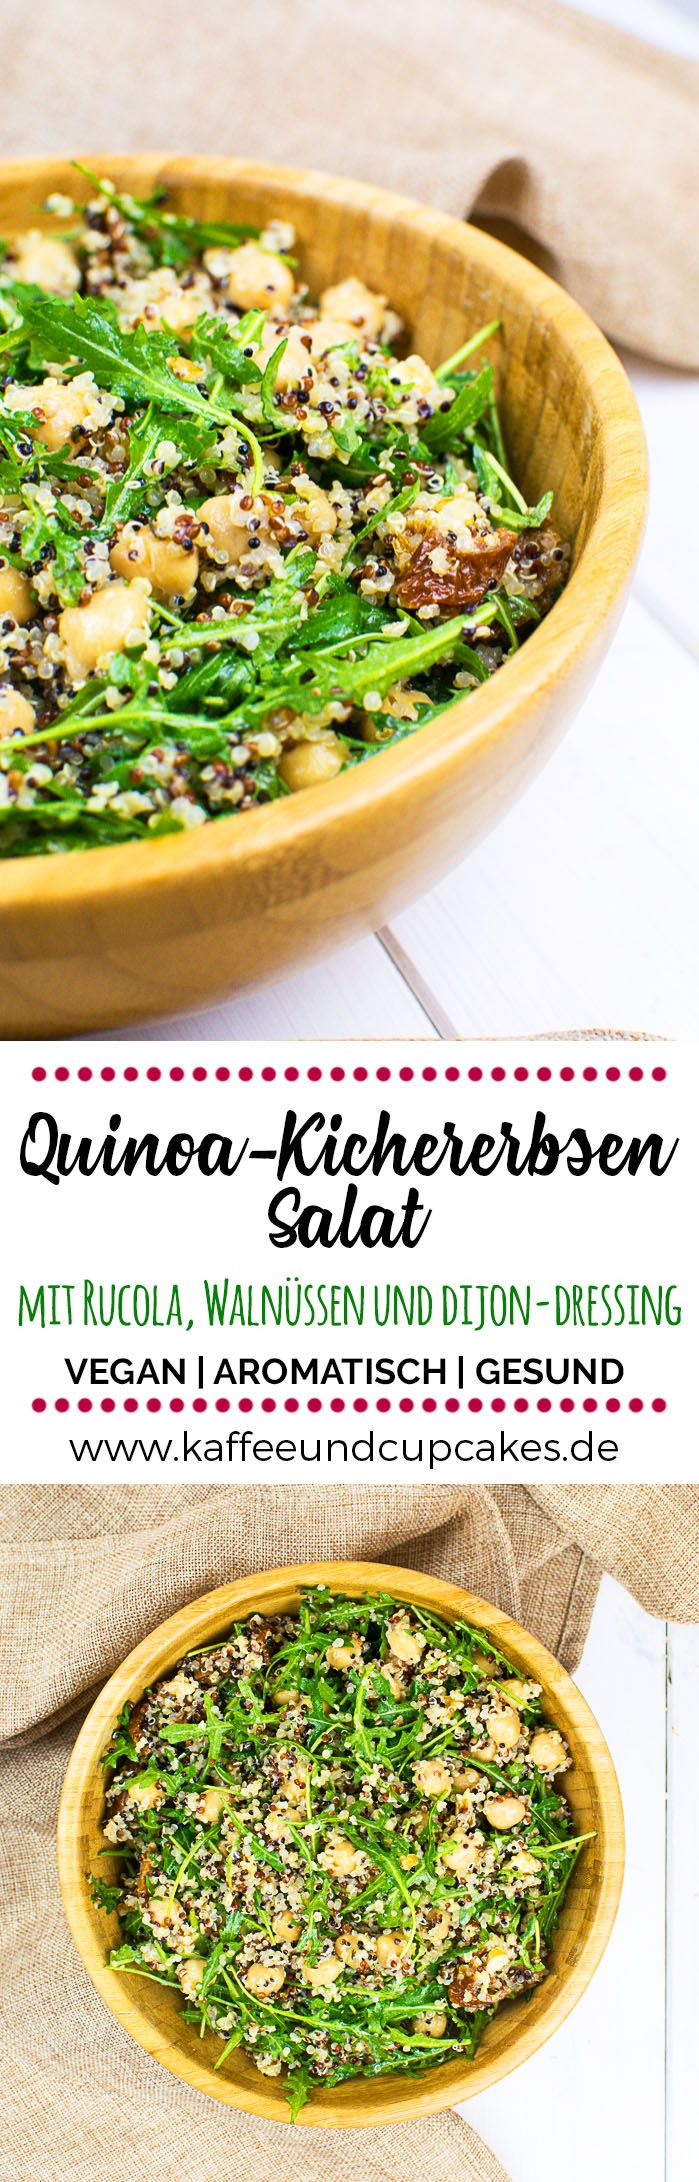 Photo of Quinoa chickpea salad with arugula